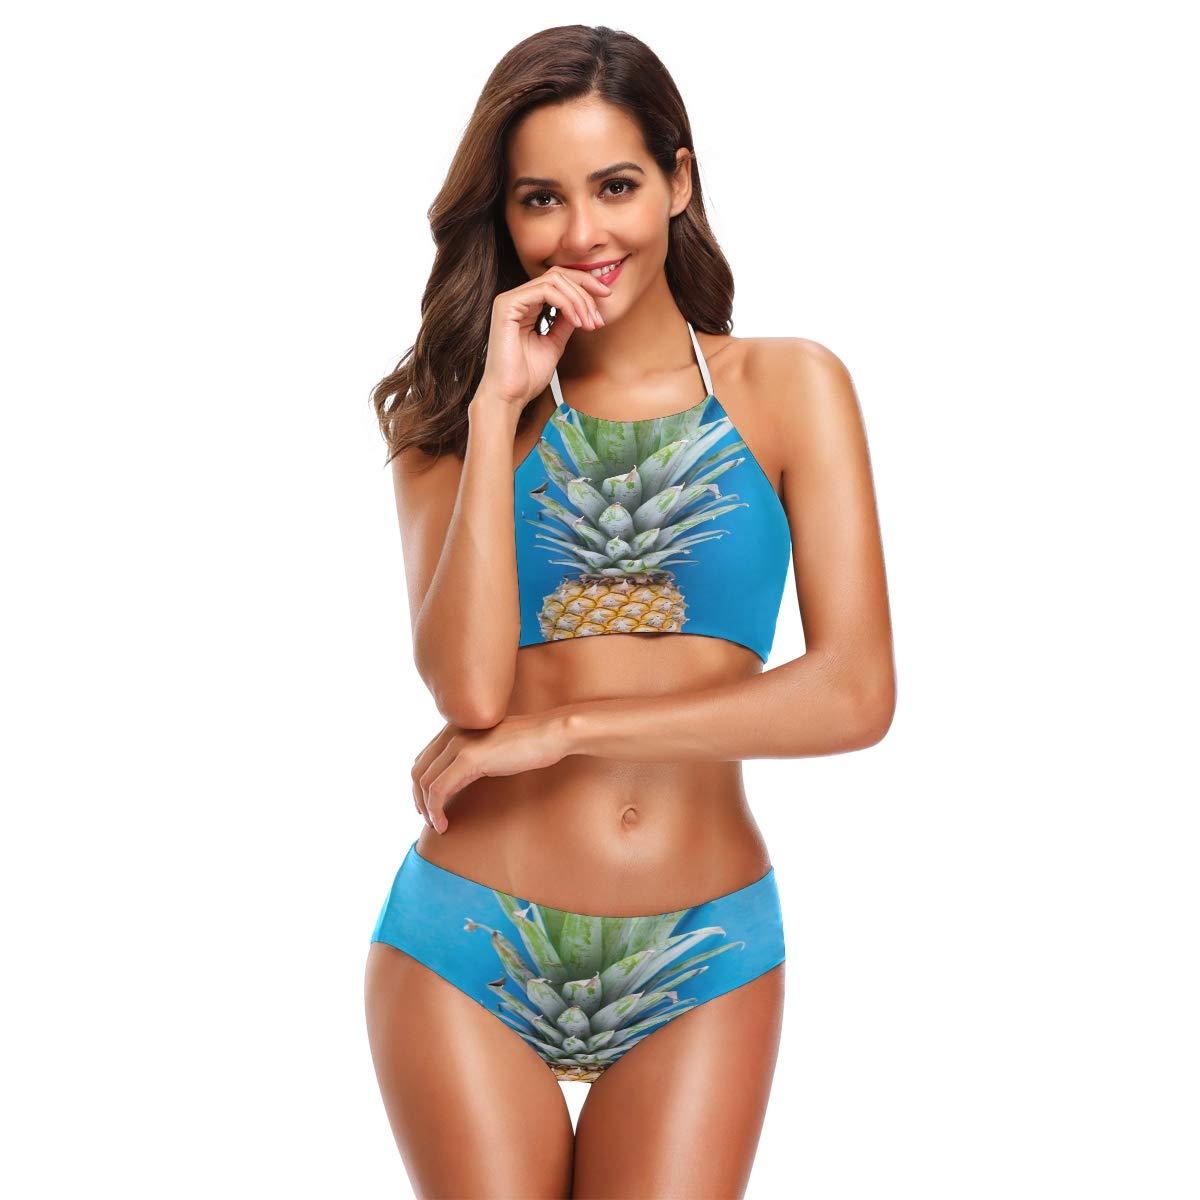 c8ffa0ade2 Amazon.com: All agree Womens Bikini Pineapple Two Piece Bathing Suits Girls  Swimsuits: Clothing